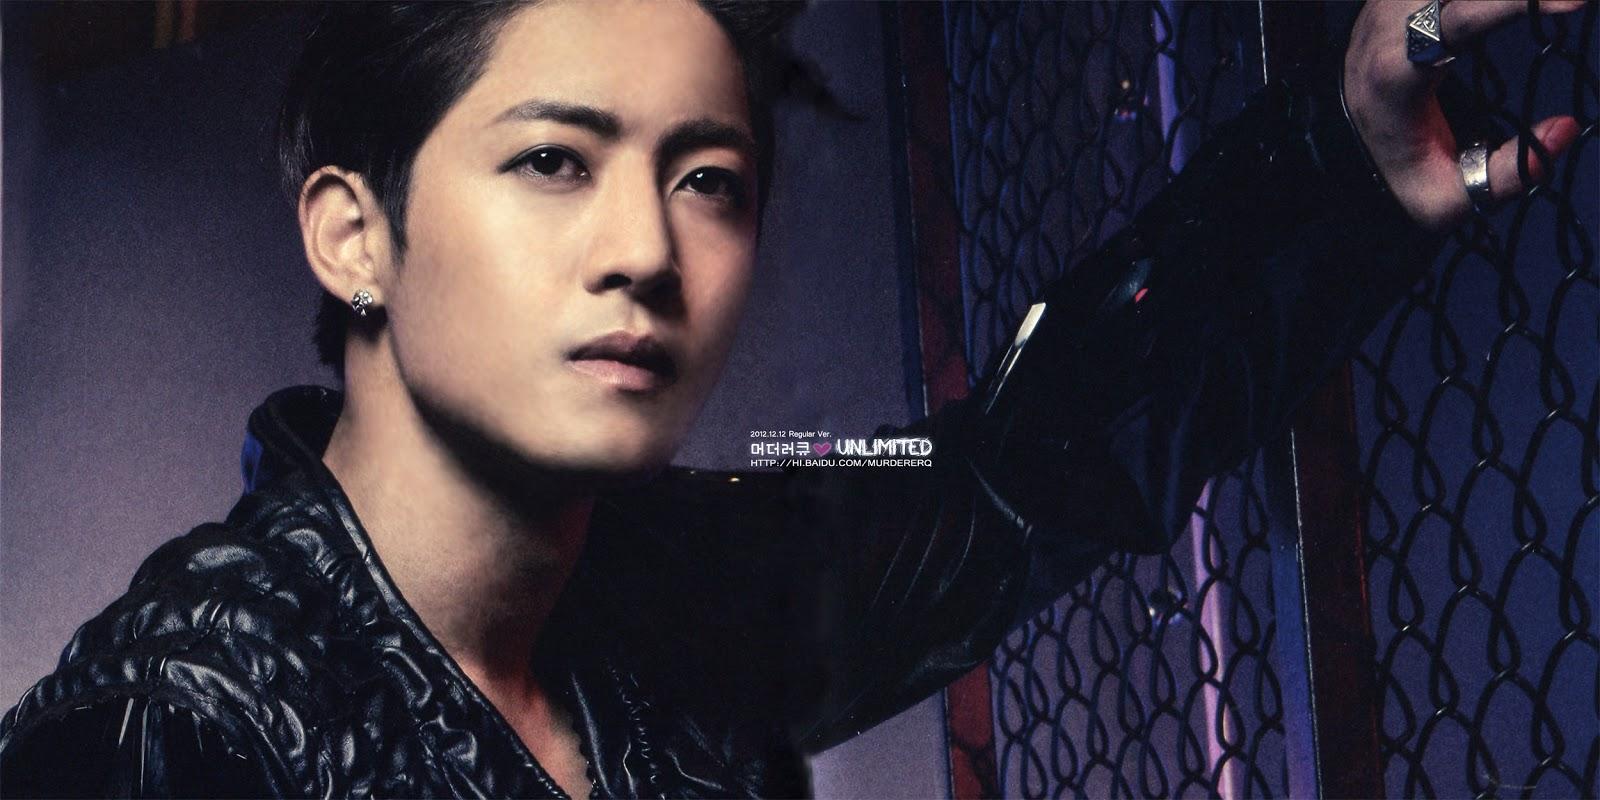 ss501 official   scan  kim hyun joong unlimited album regular version